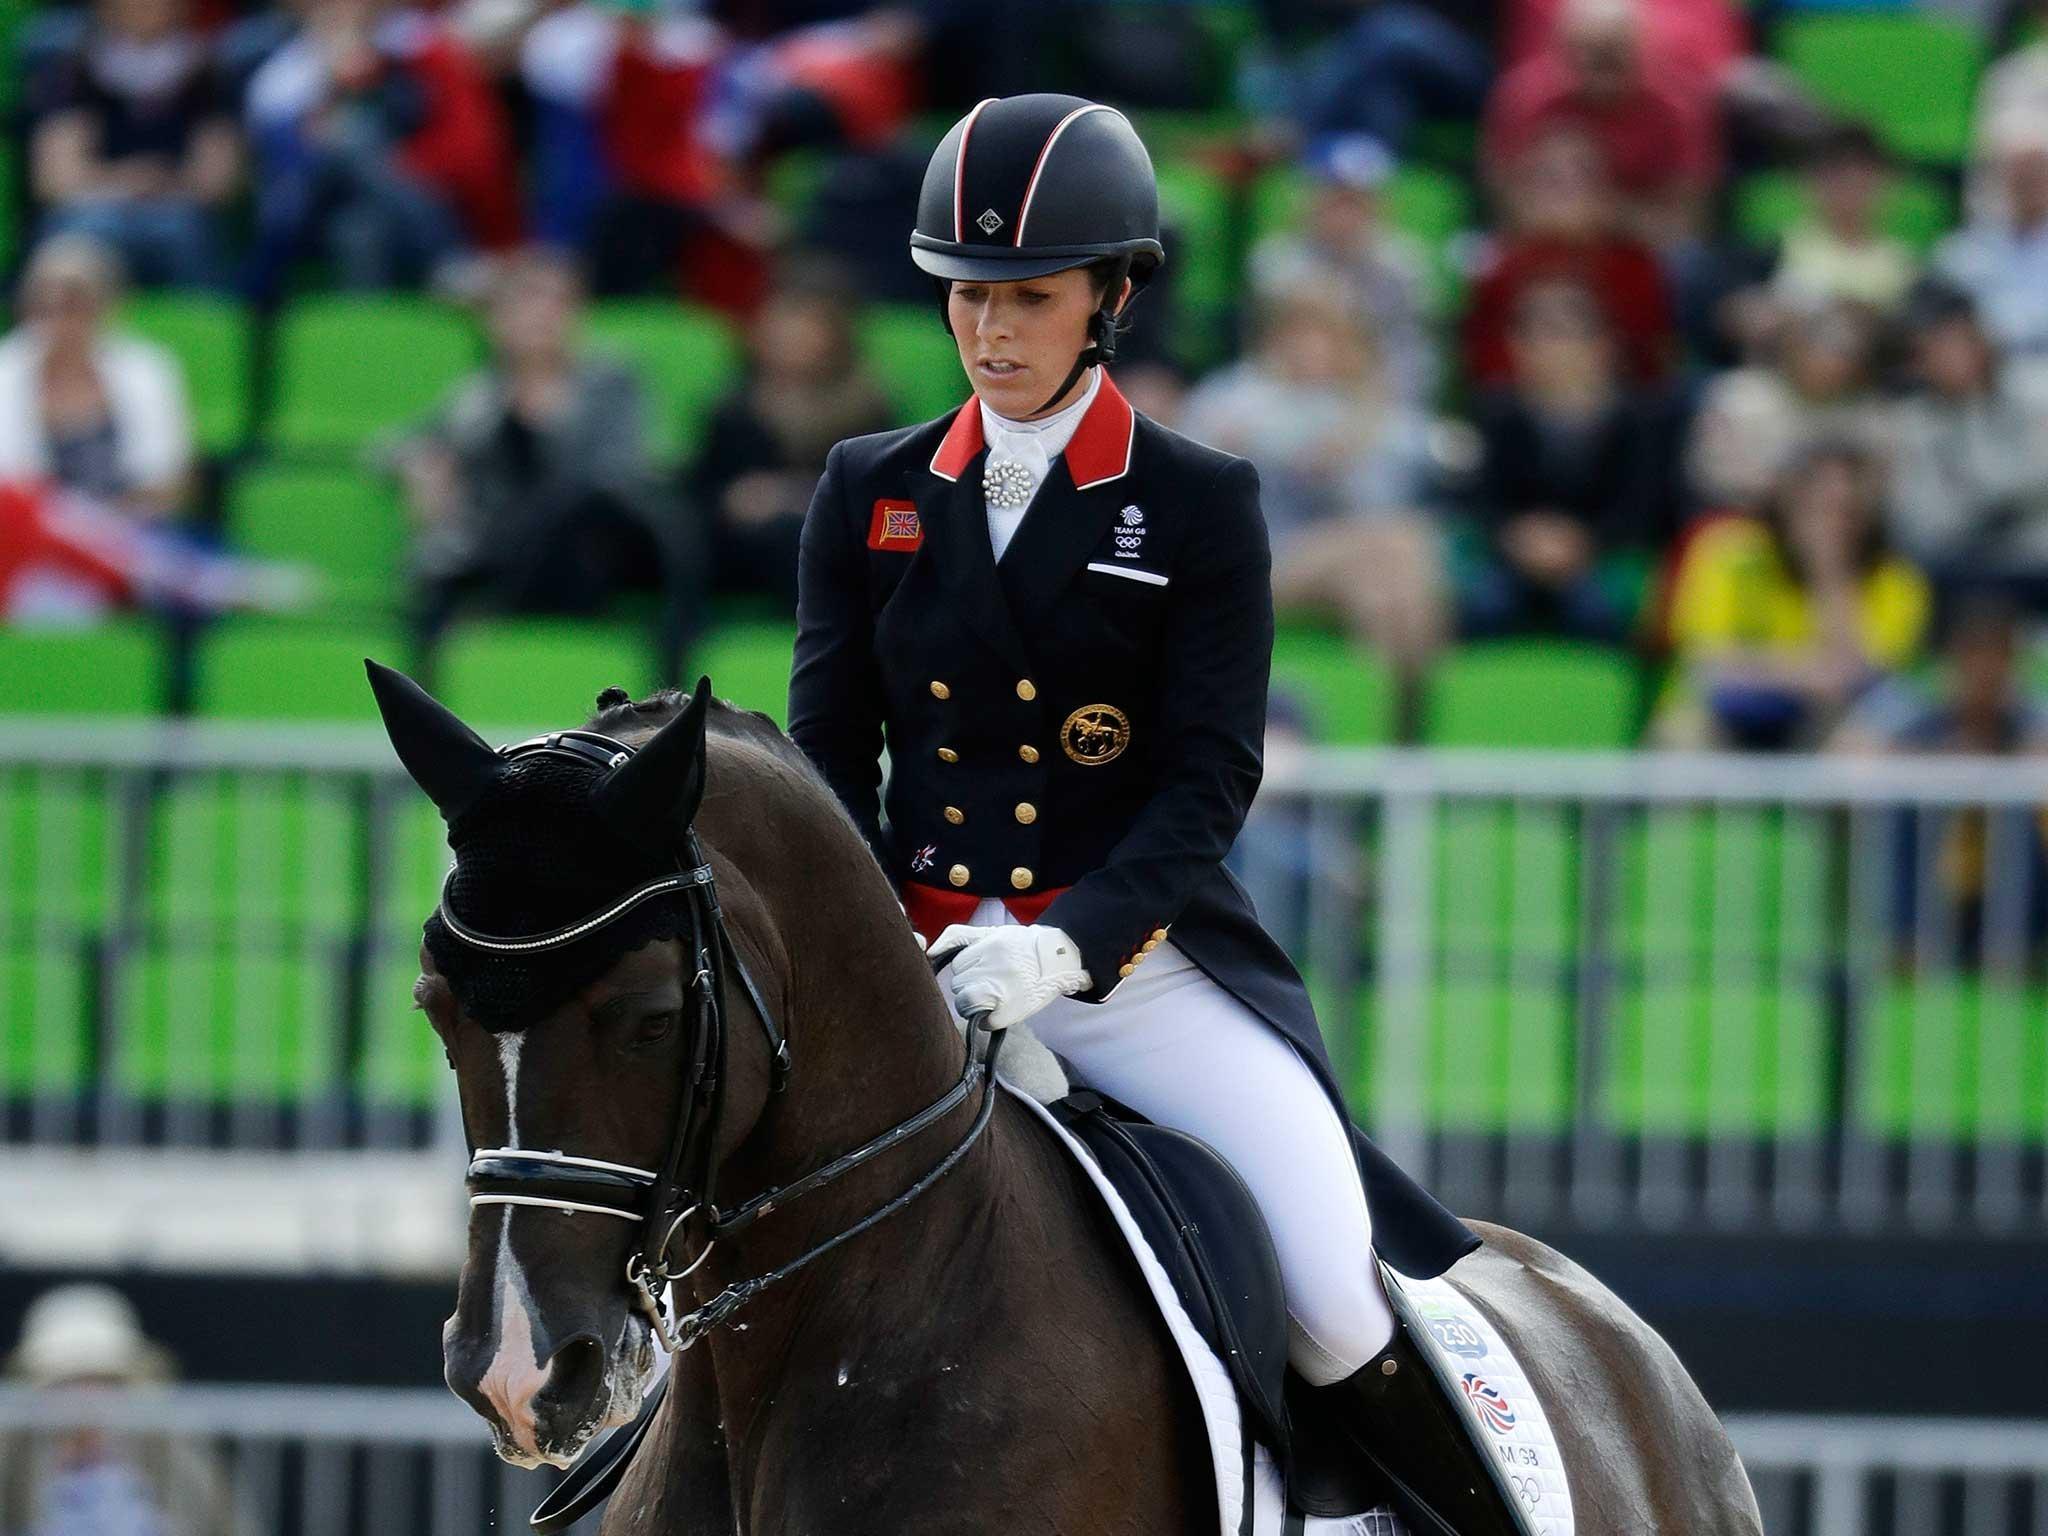 Charlotte Dujardin rides Valegro to victory